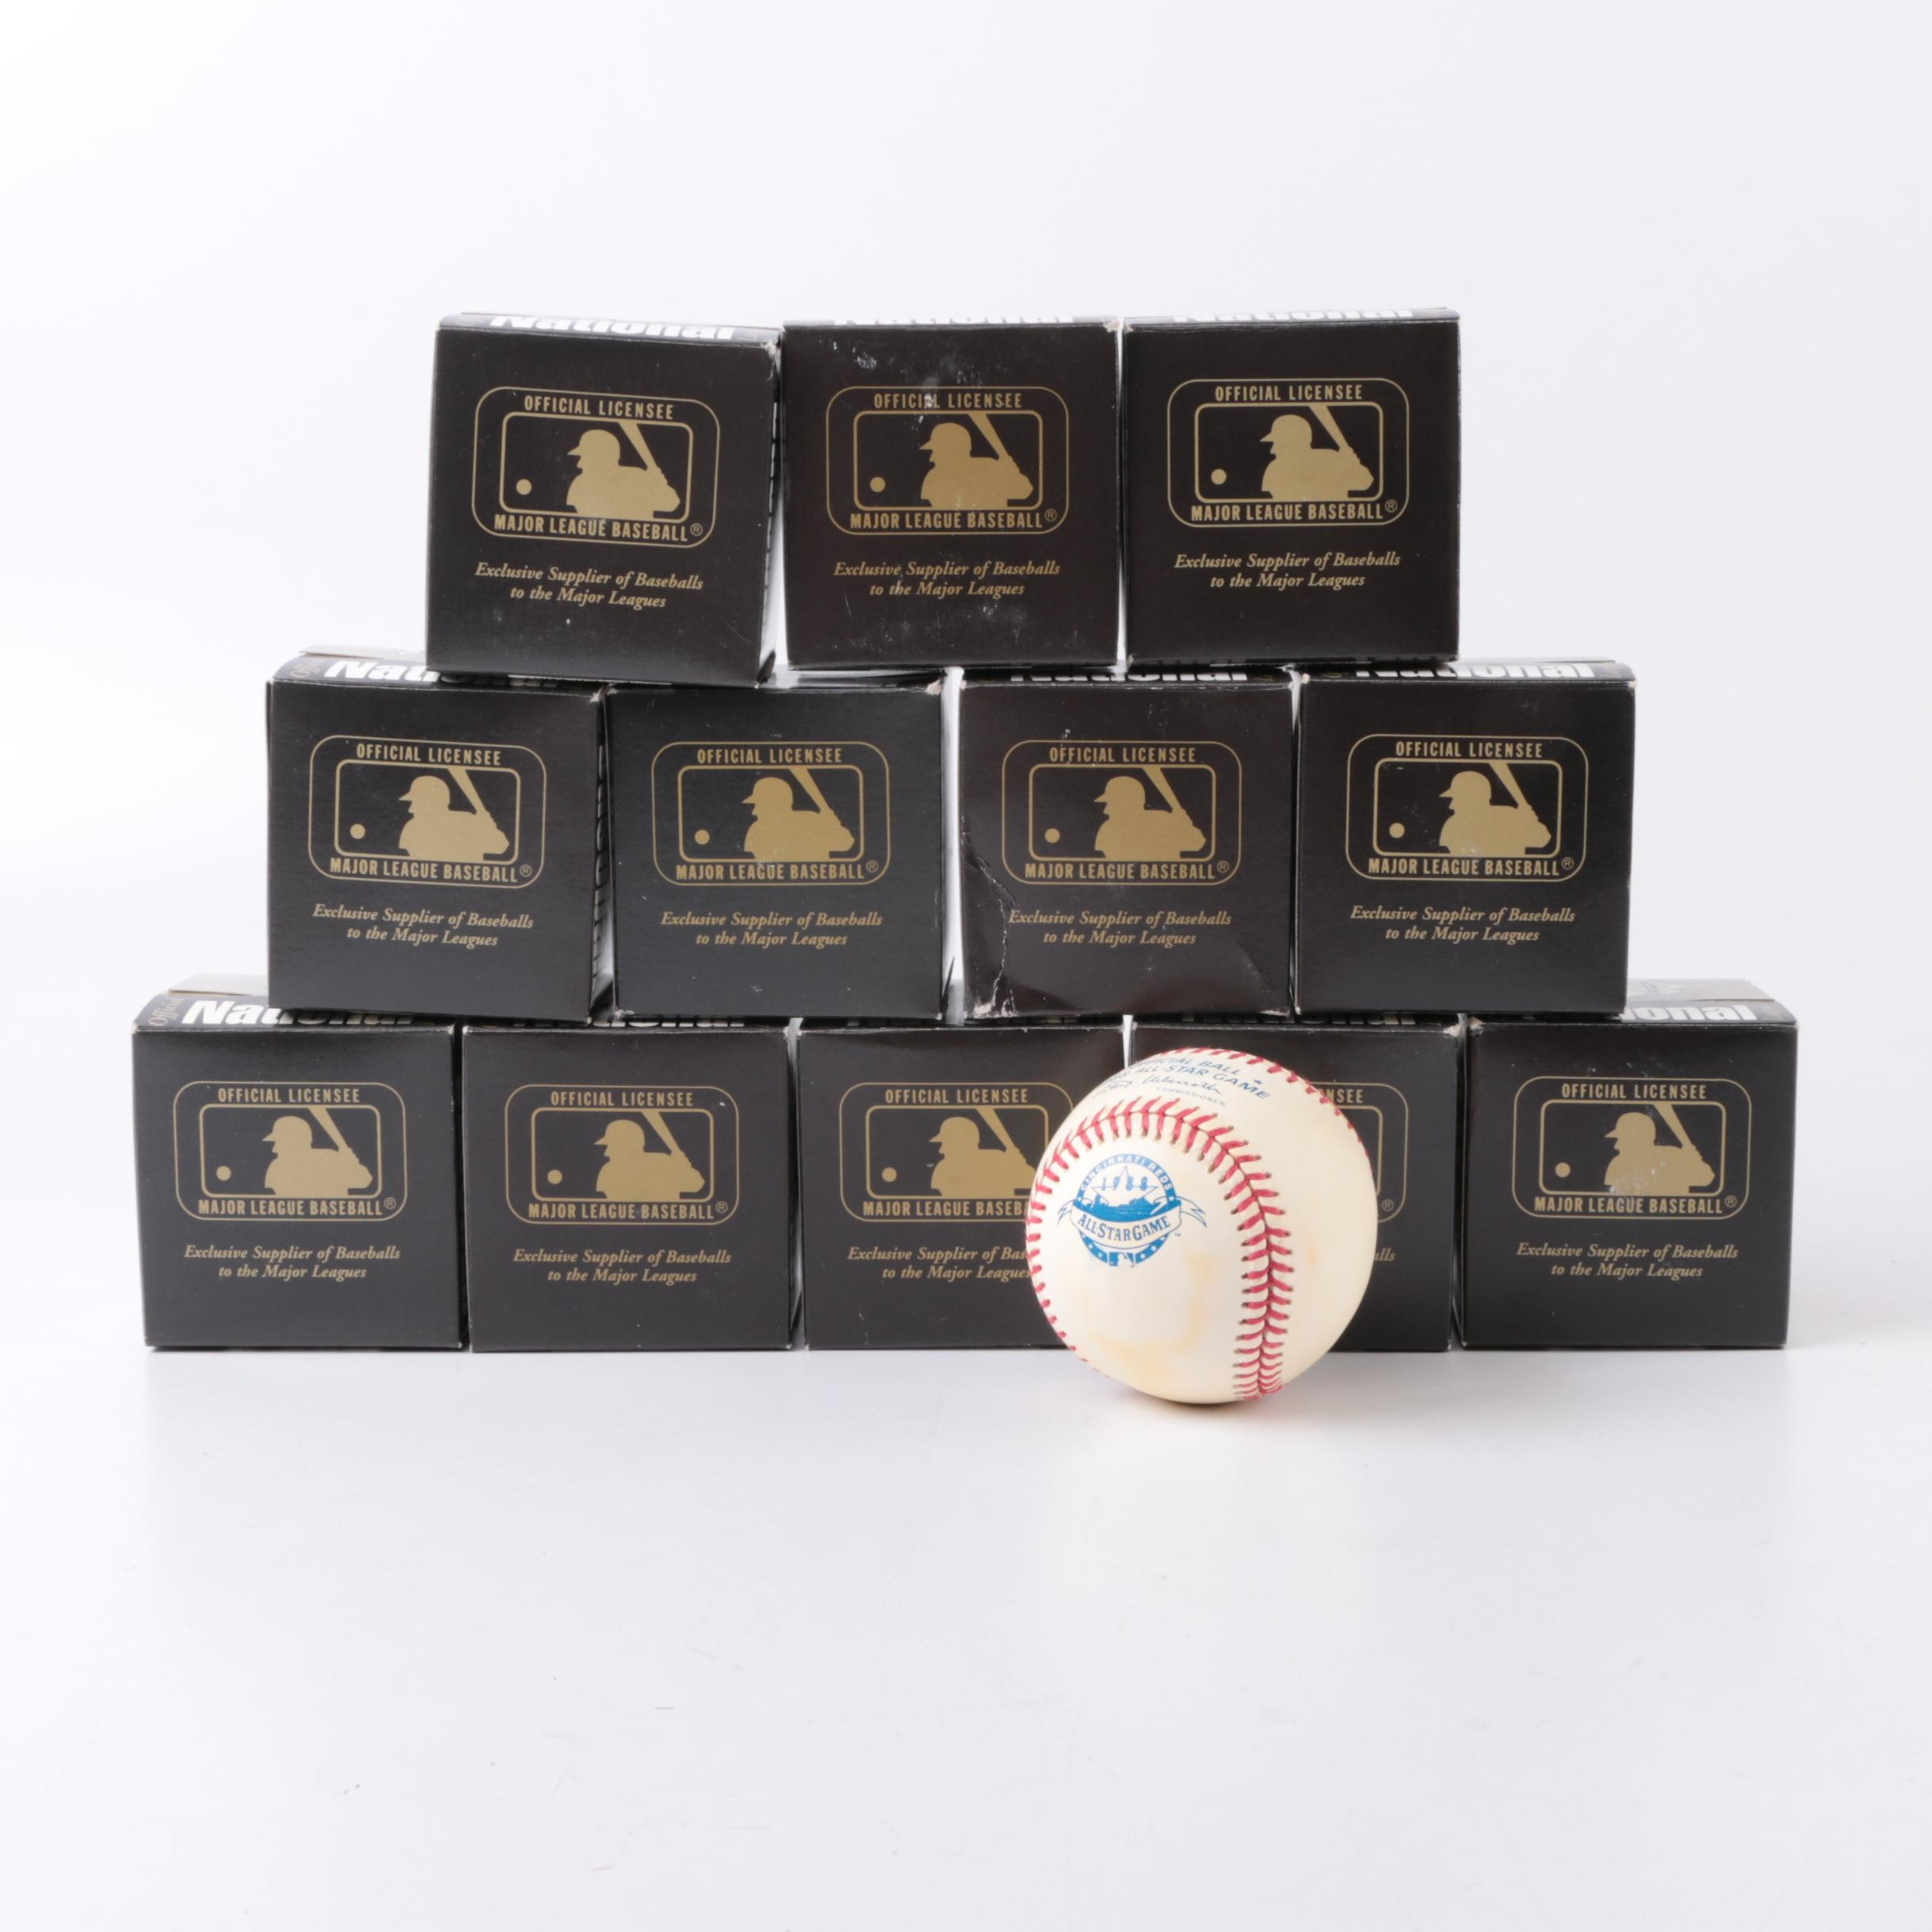 Collection of Rawlings Baseballs